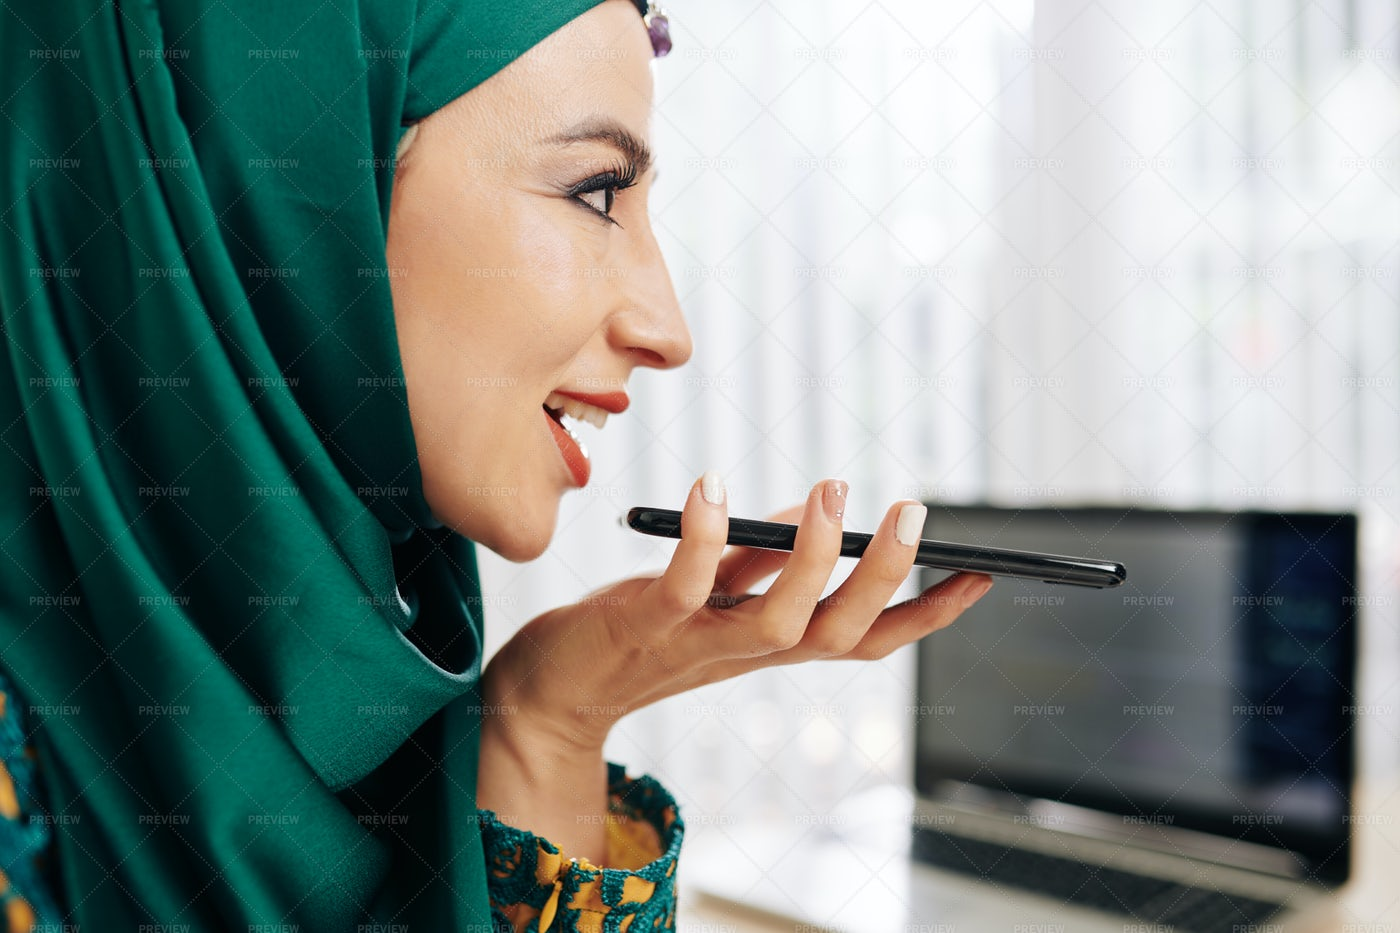 Businesswoman Recording Voice Message: Stock Photos